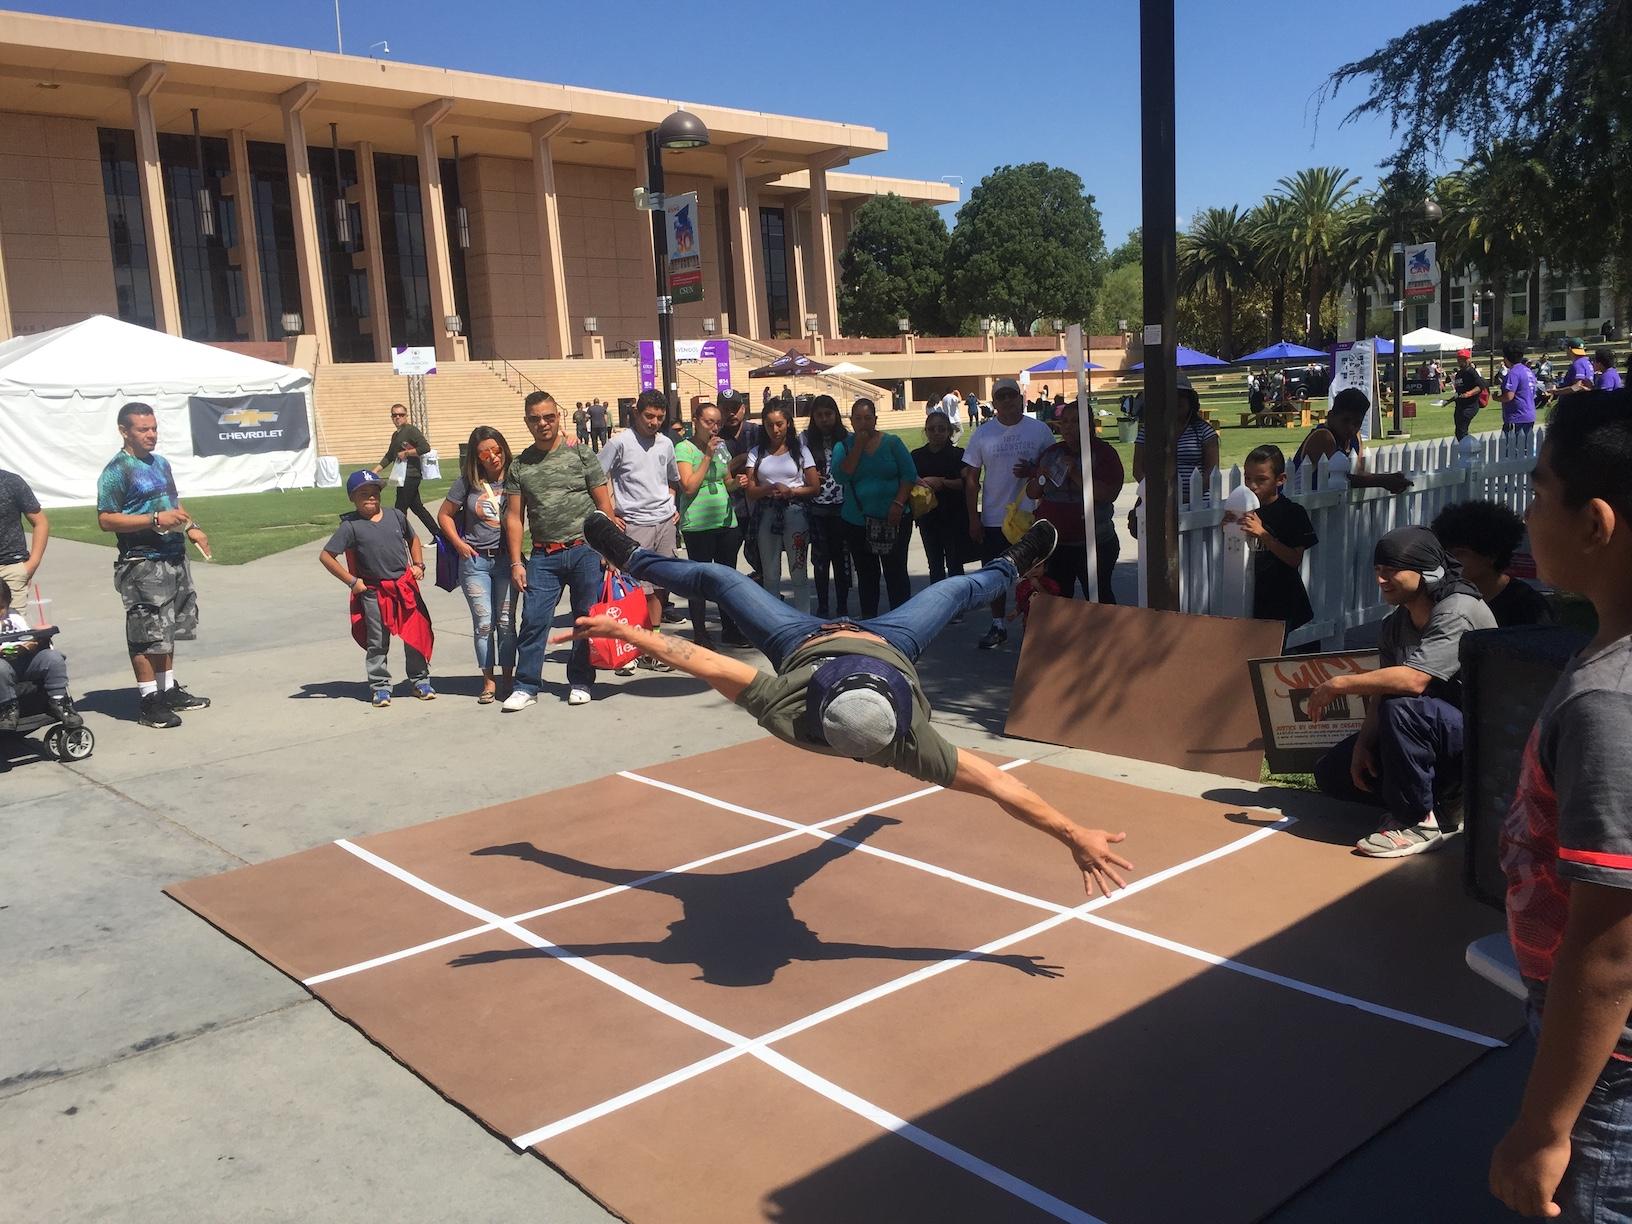 JUiCE Los Angeles Hip Hop Nonprofit Breakdance Music Art Community Youth Breakdance Los Angeles Air Flair Bboying Teach.JPG